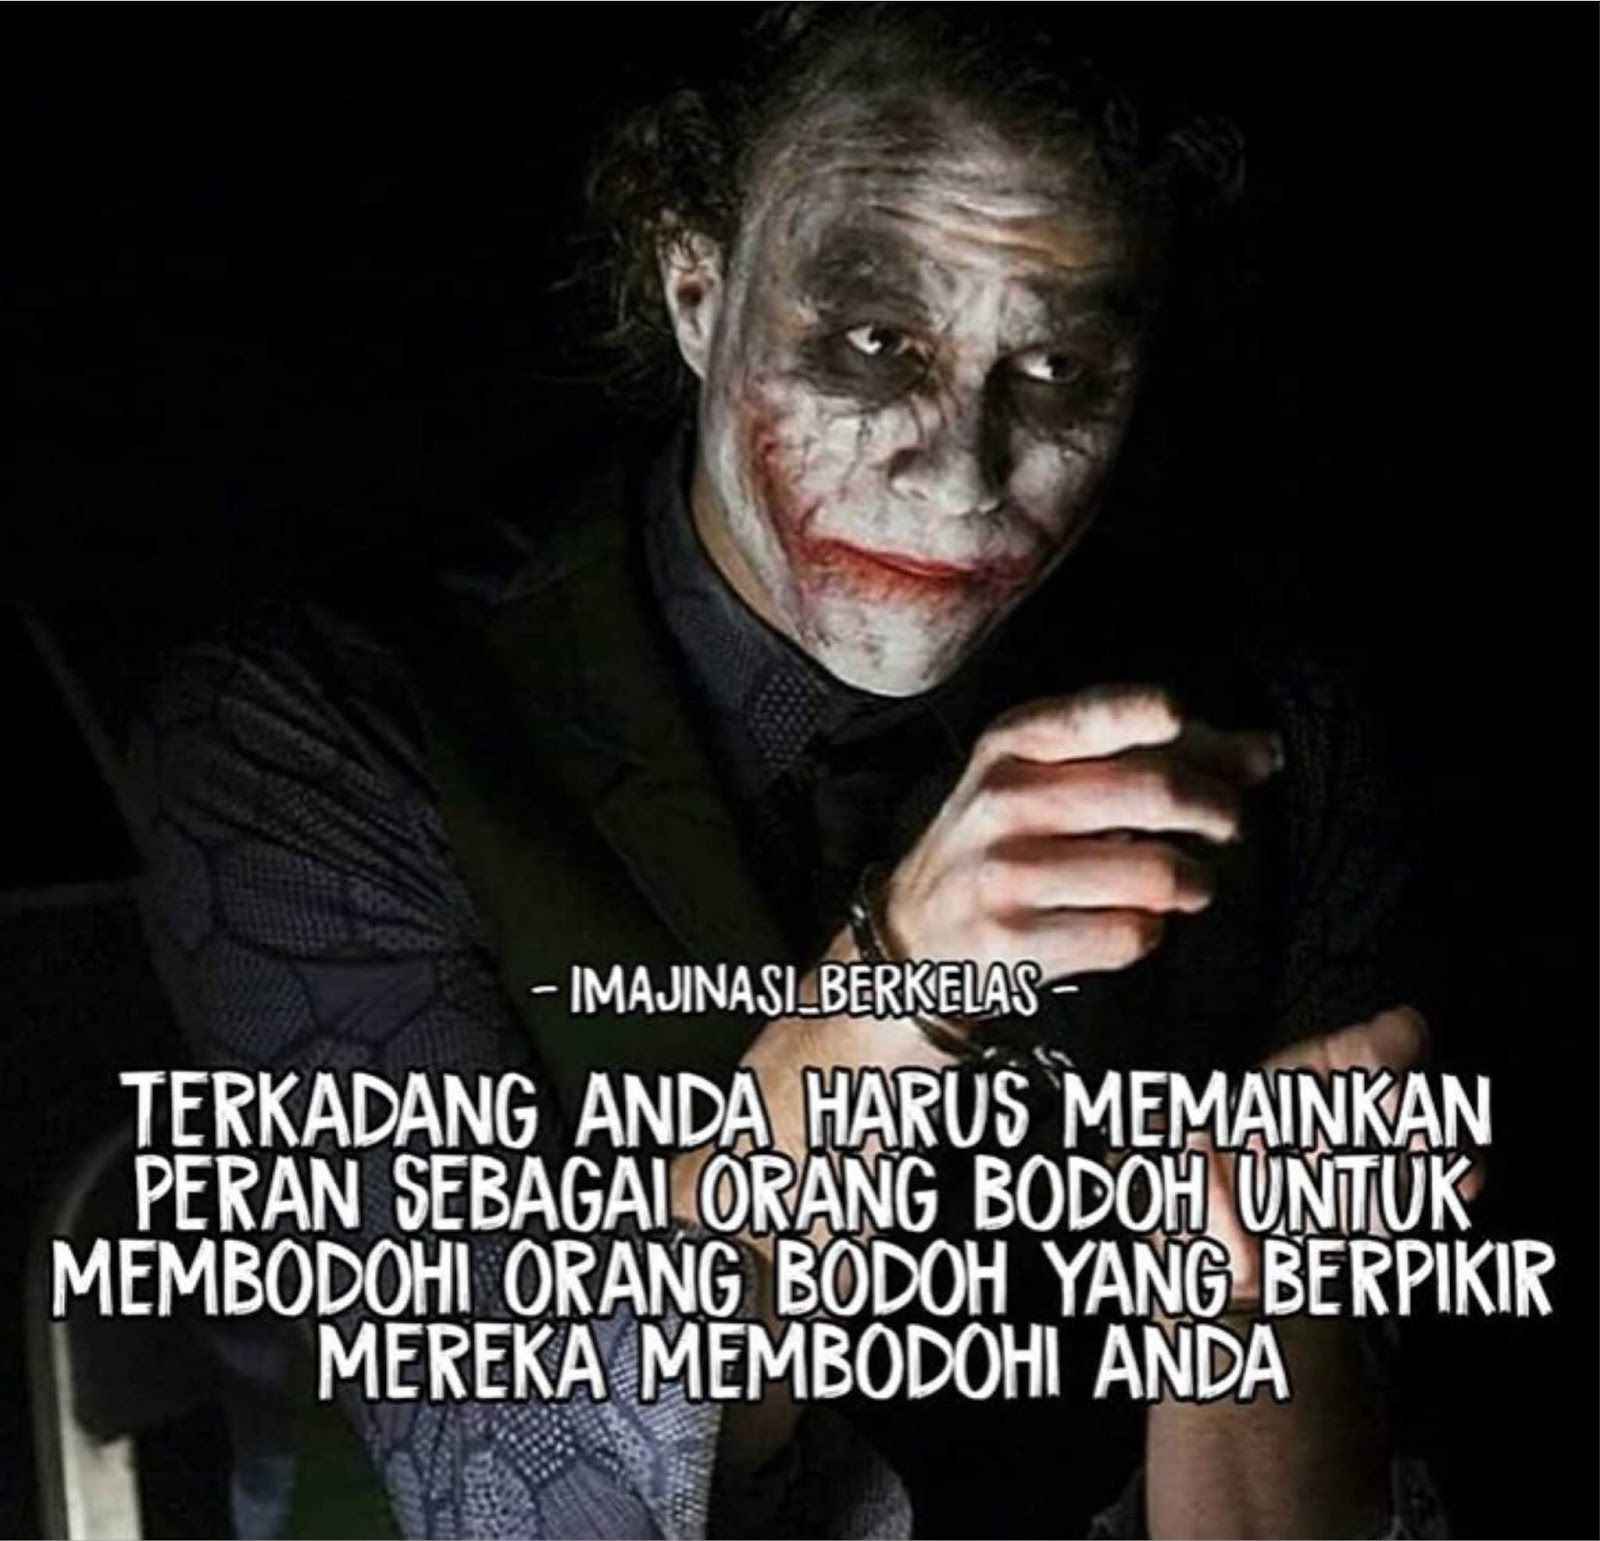 14 Kata Kata Quotes Joker Cinta Di 2020 Dengan Gambar Joker